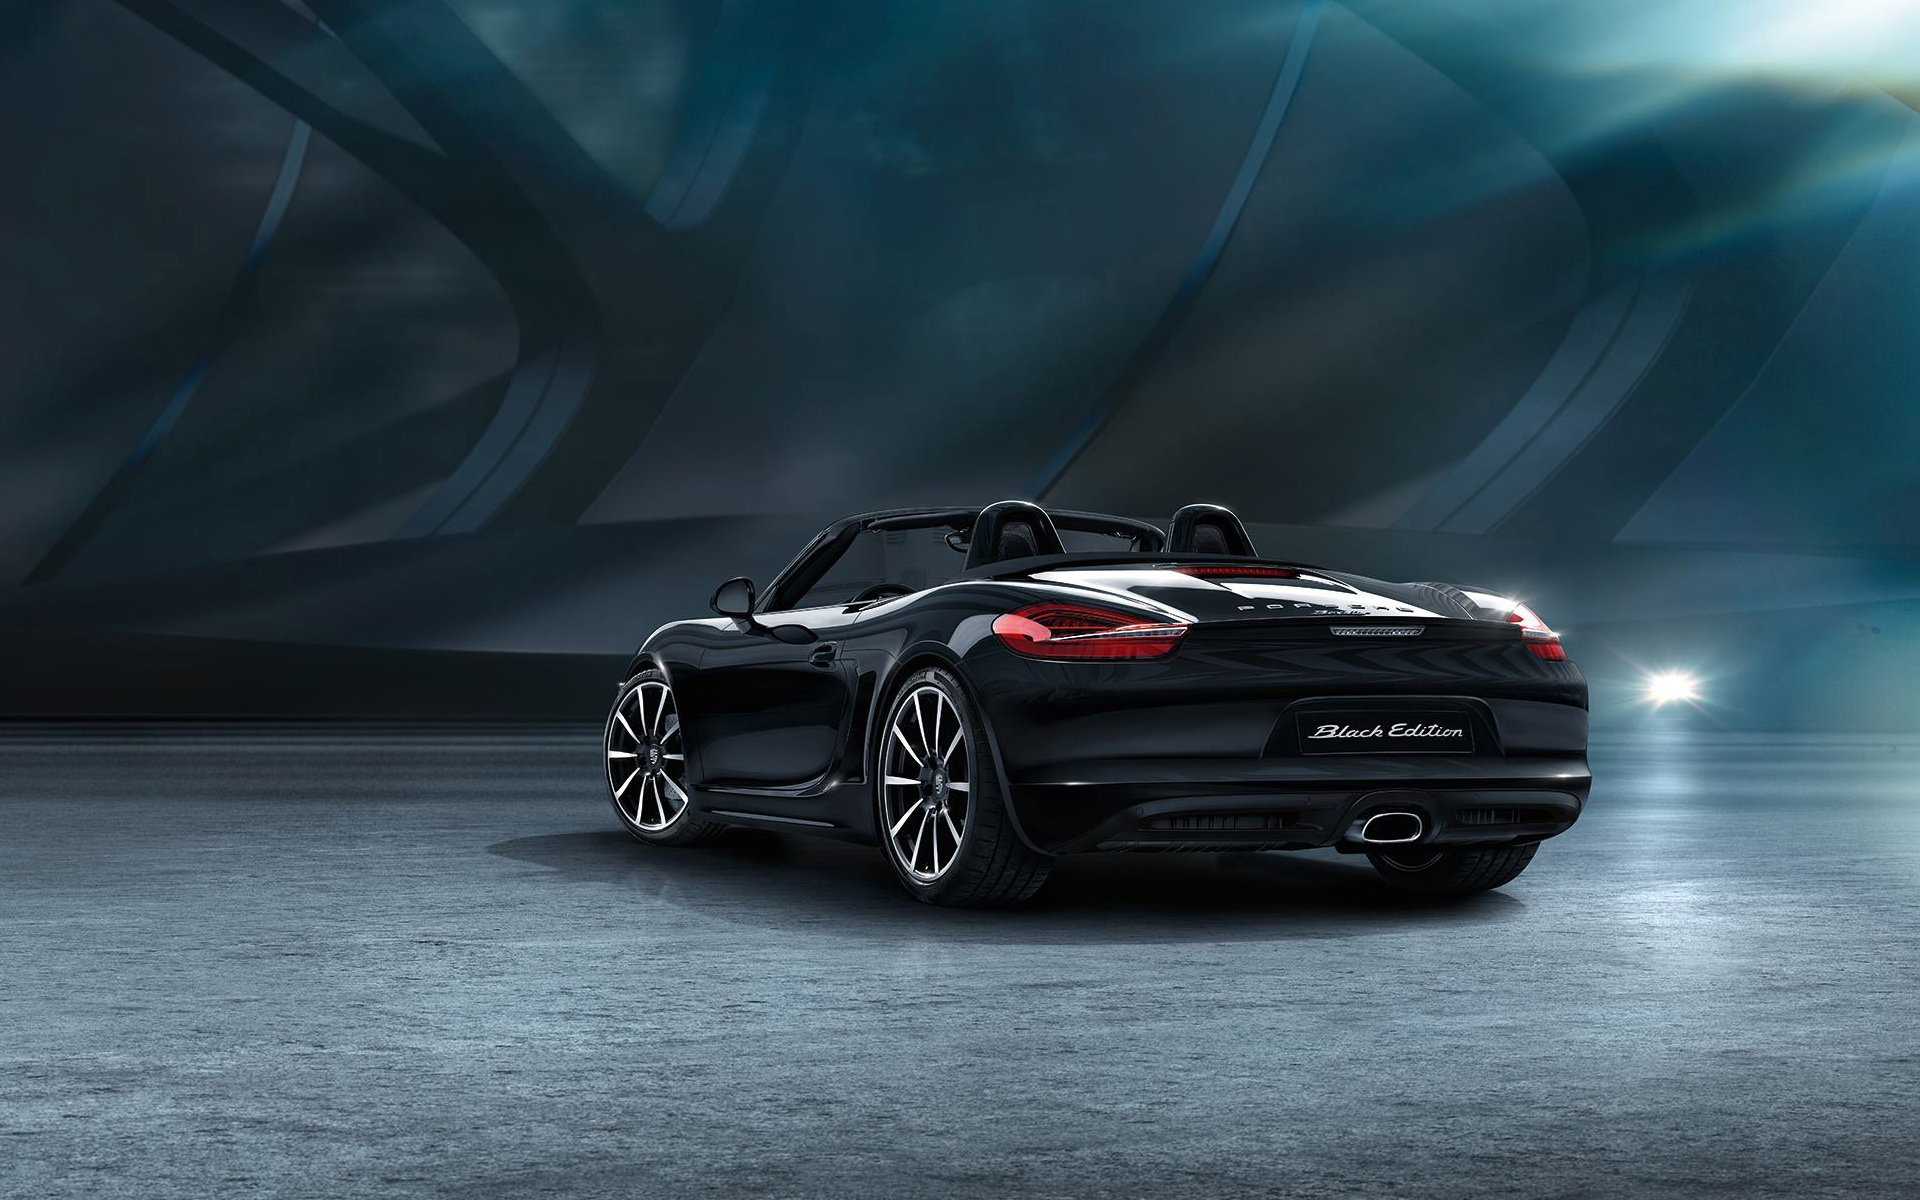 Mercedes Car Wallpapers For Windows 7 2015 Porsche Boxster Black Edition 2 Wallpaper Hd Car